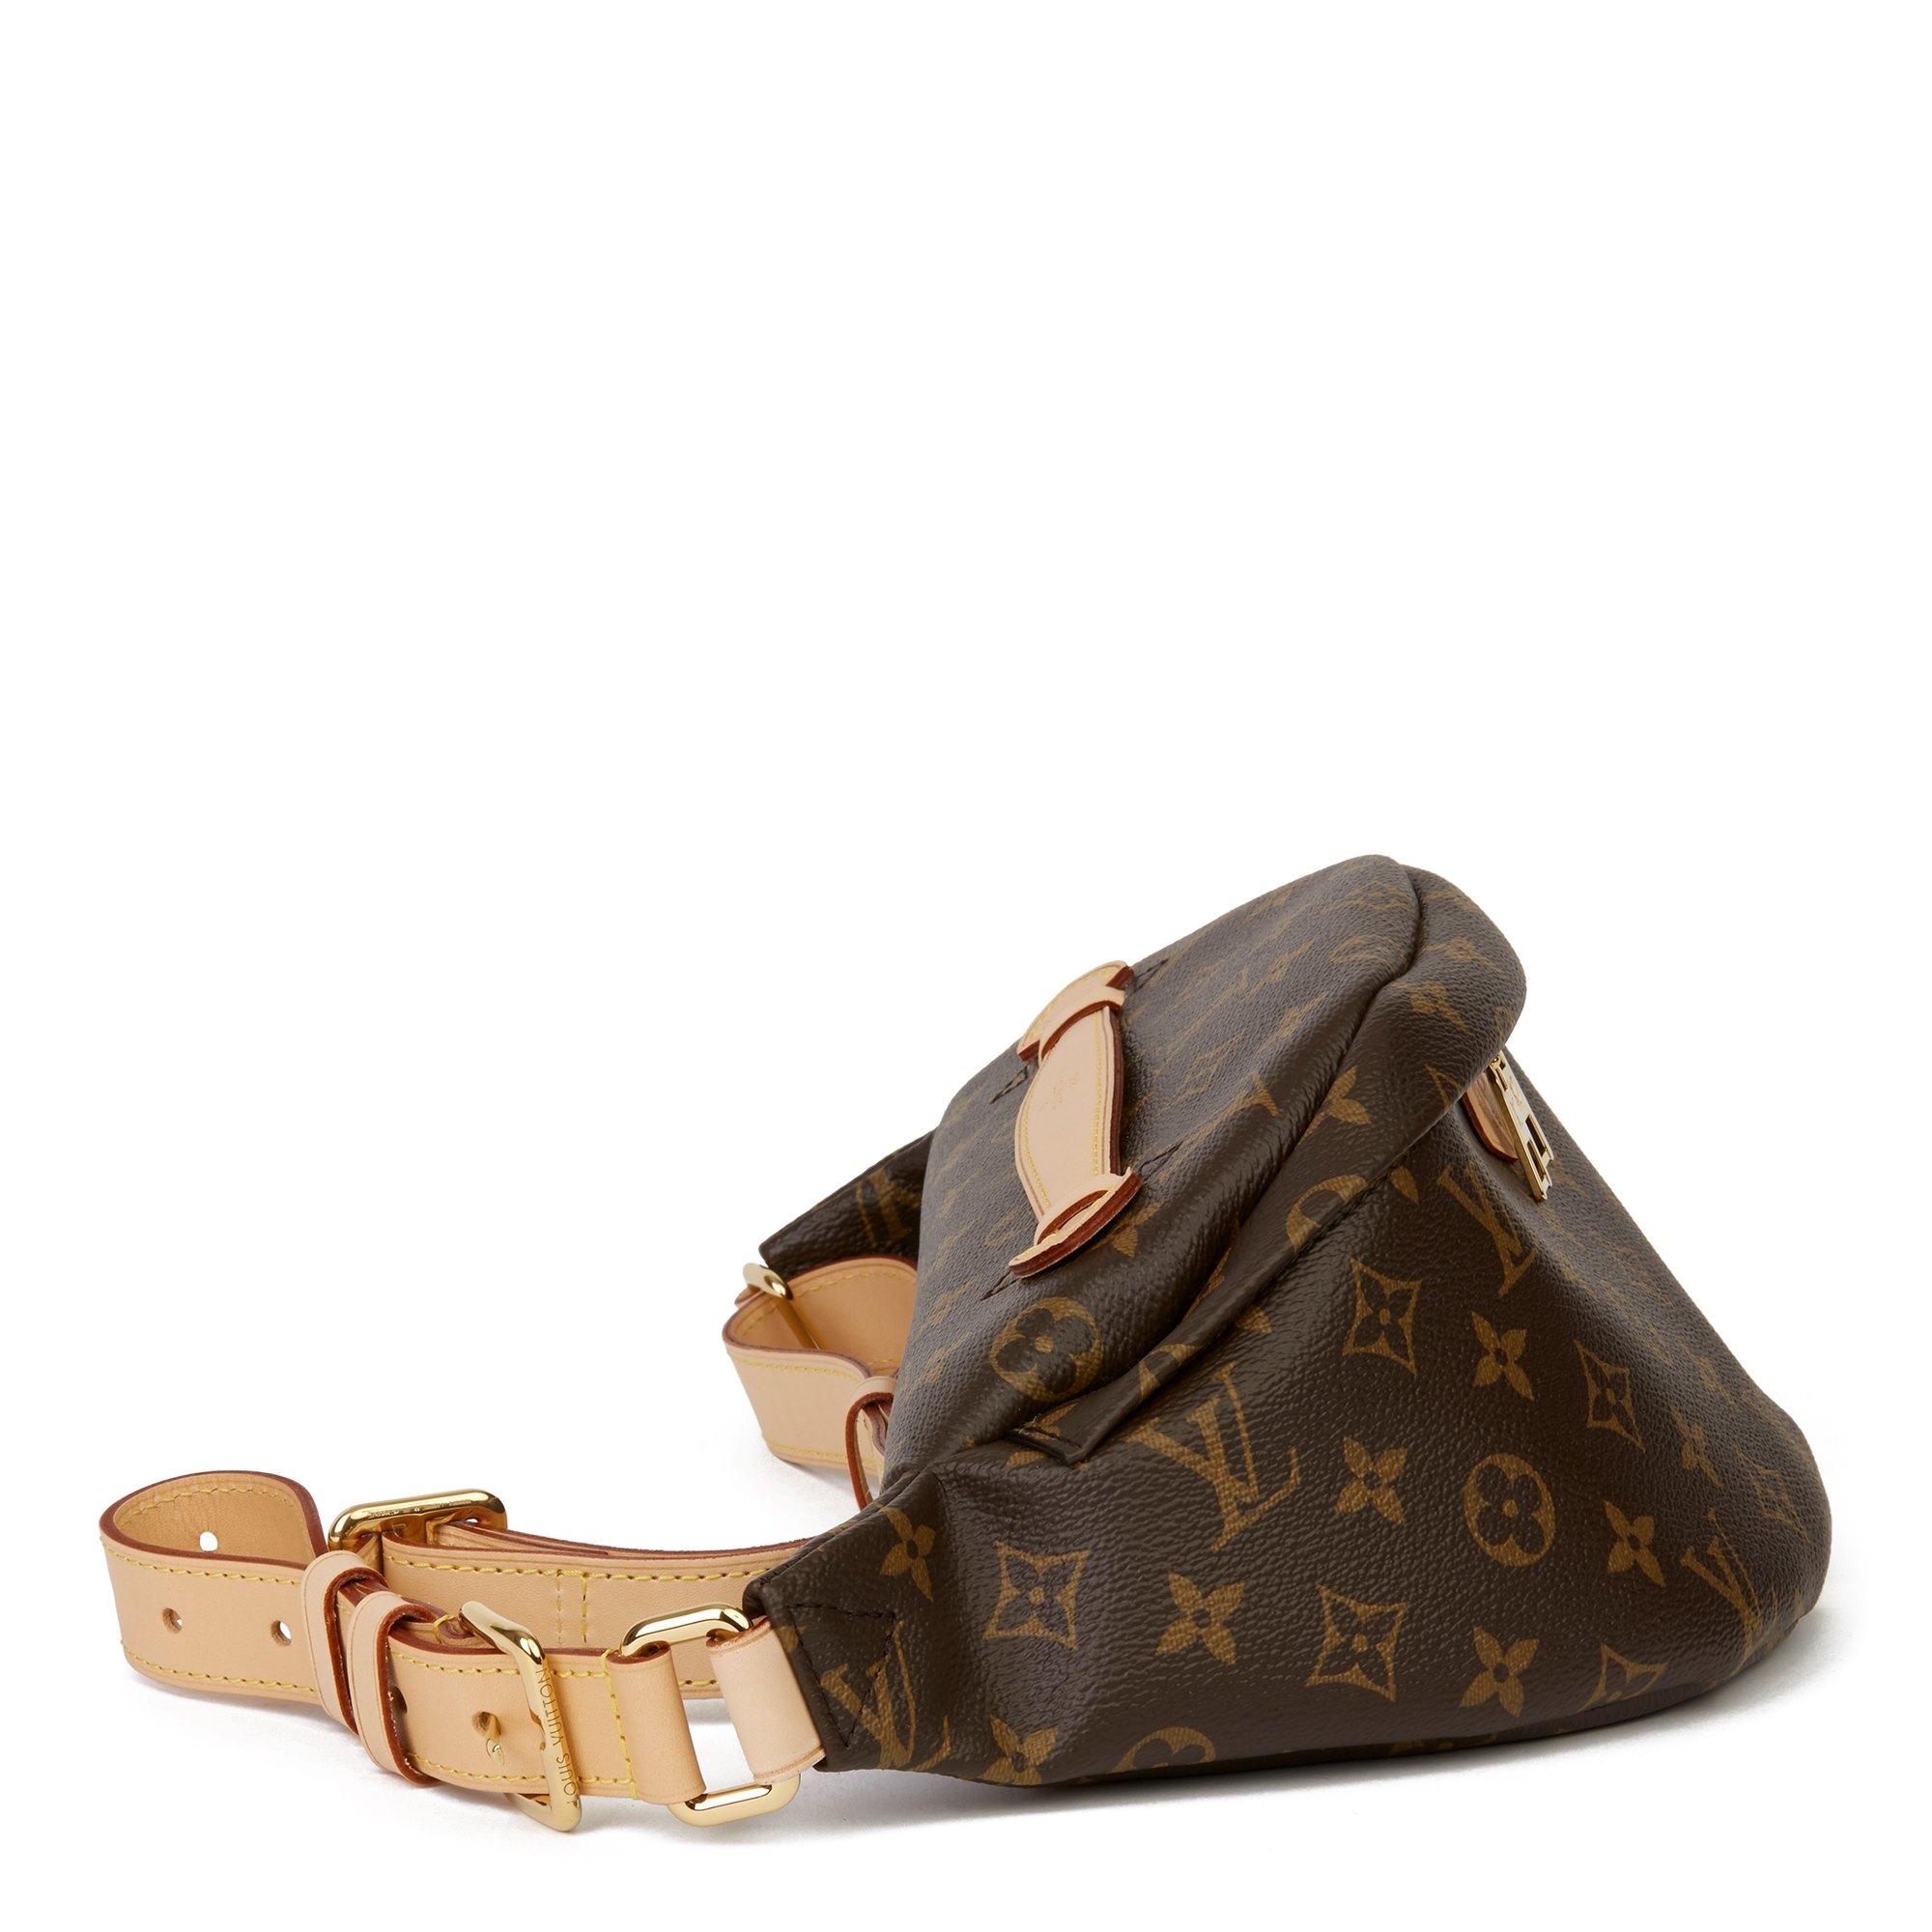 Louis Vuitton Brown Monogram Coated Canvas Bum Bag